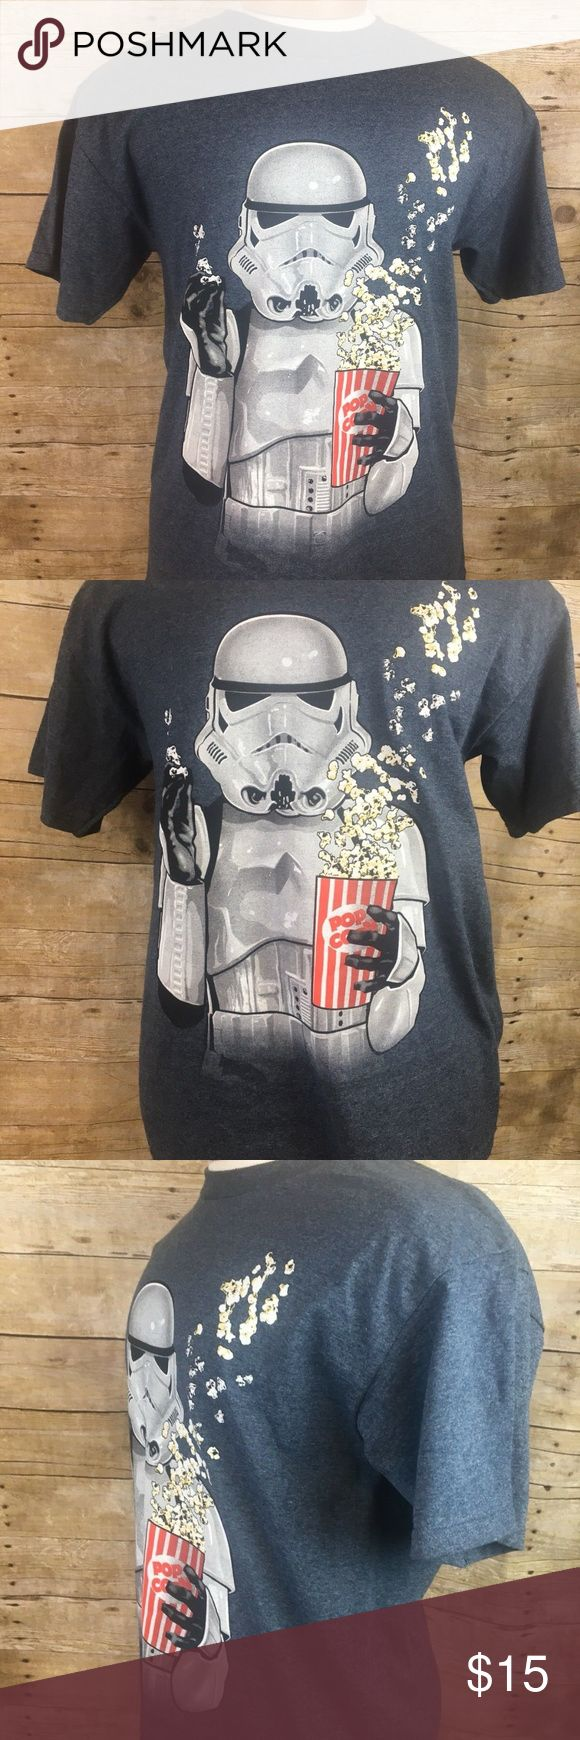 Star Wars Storm Trooper Holding Popcorn Tshirt Star